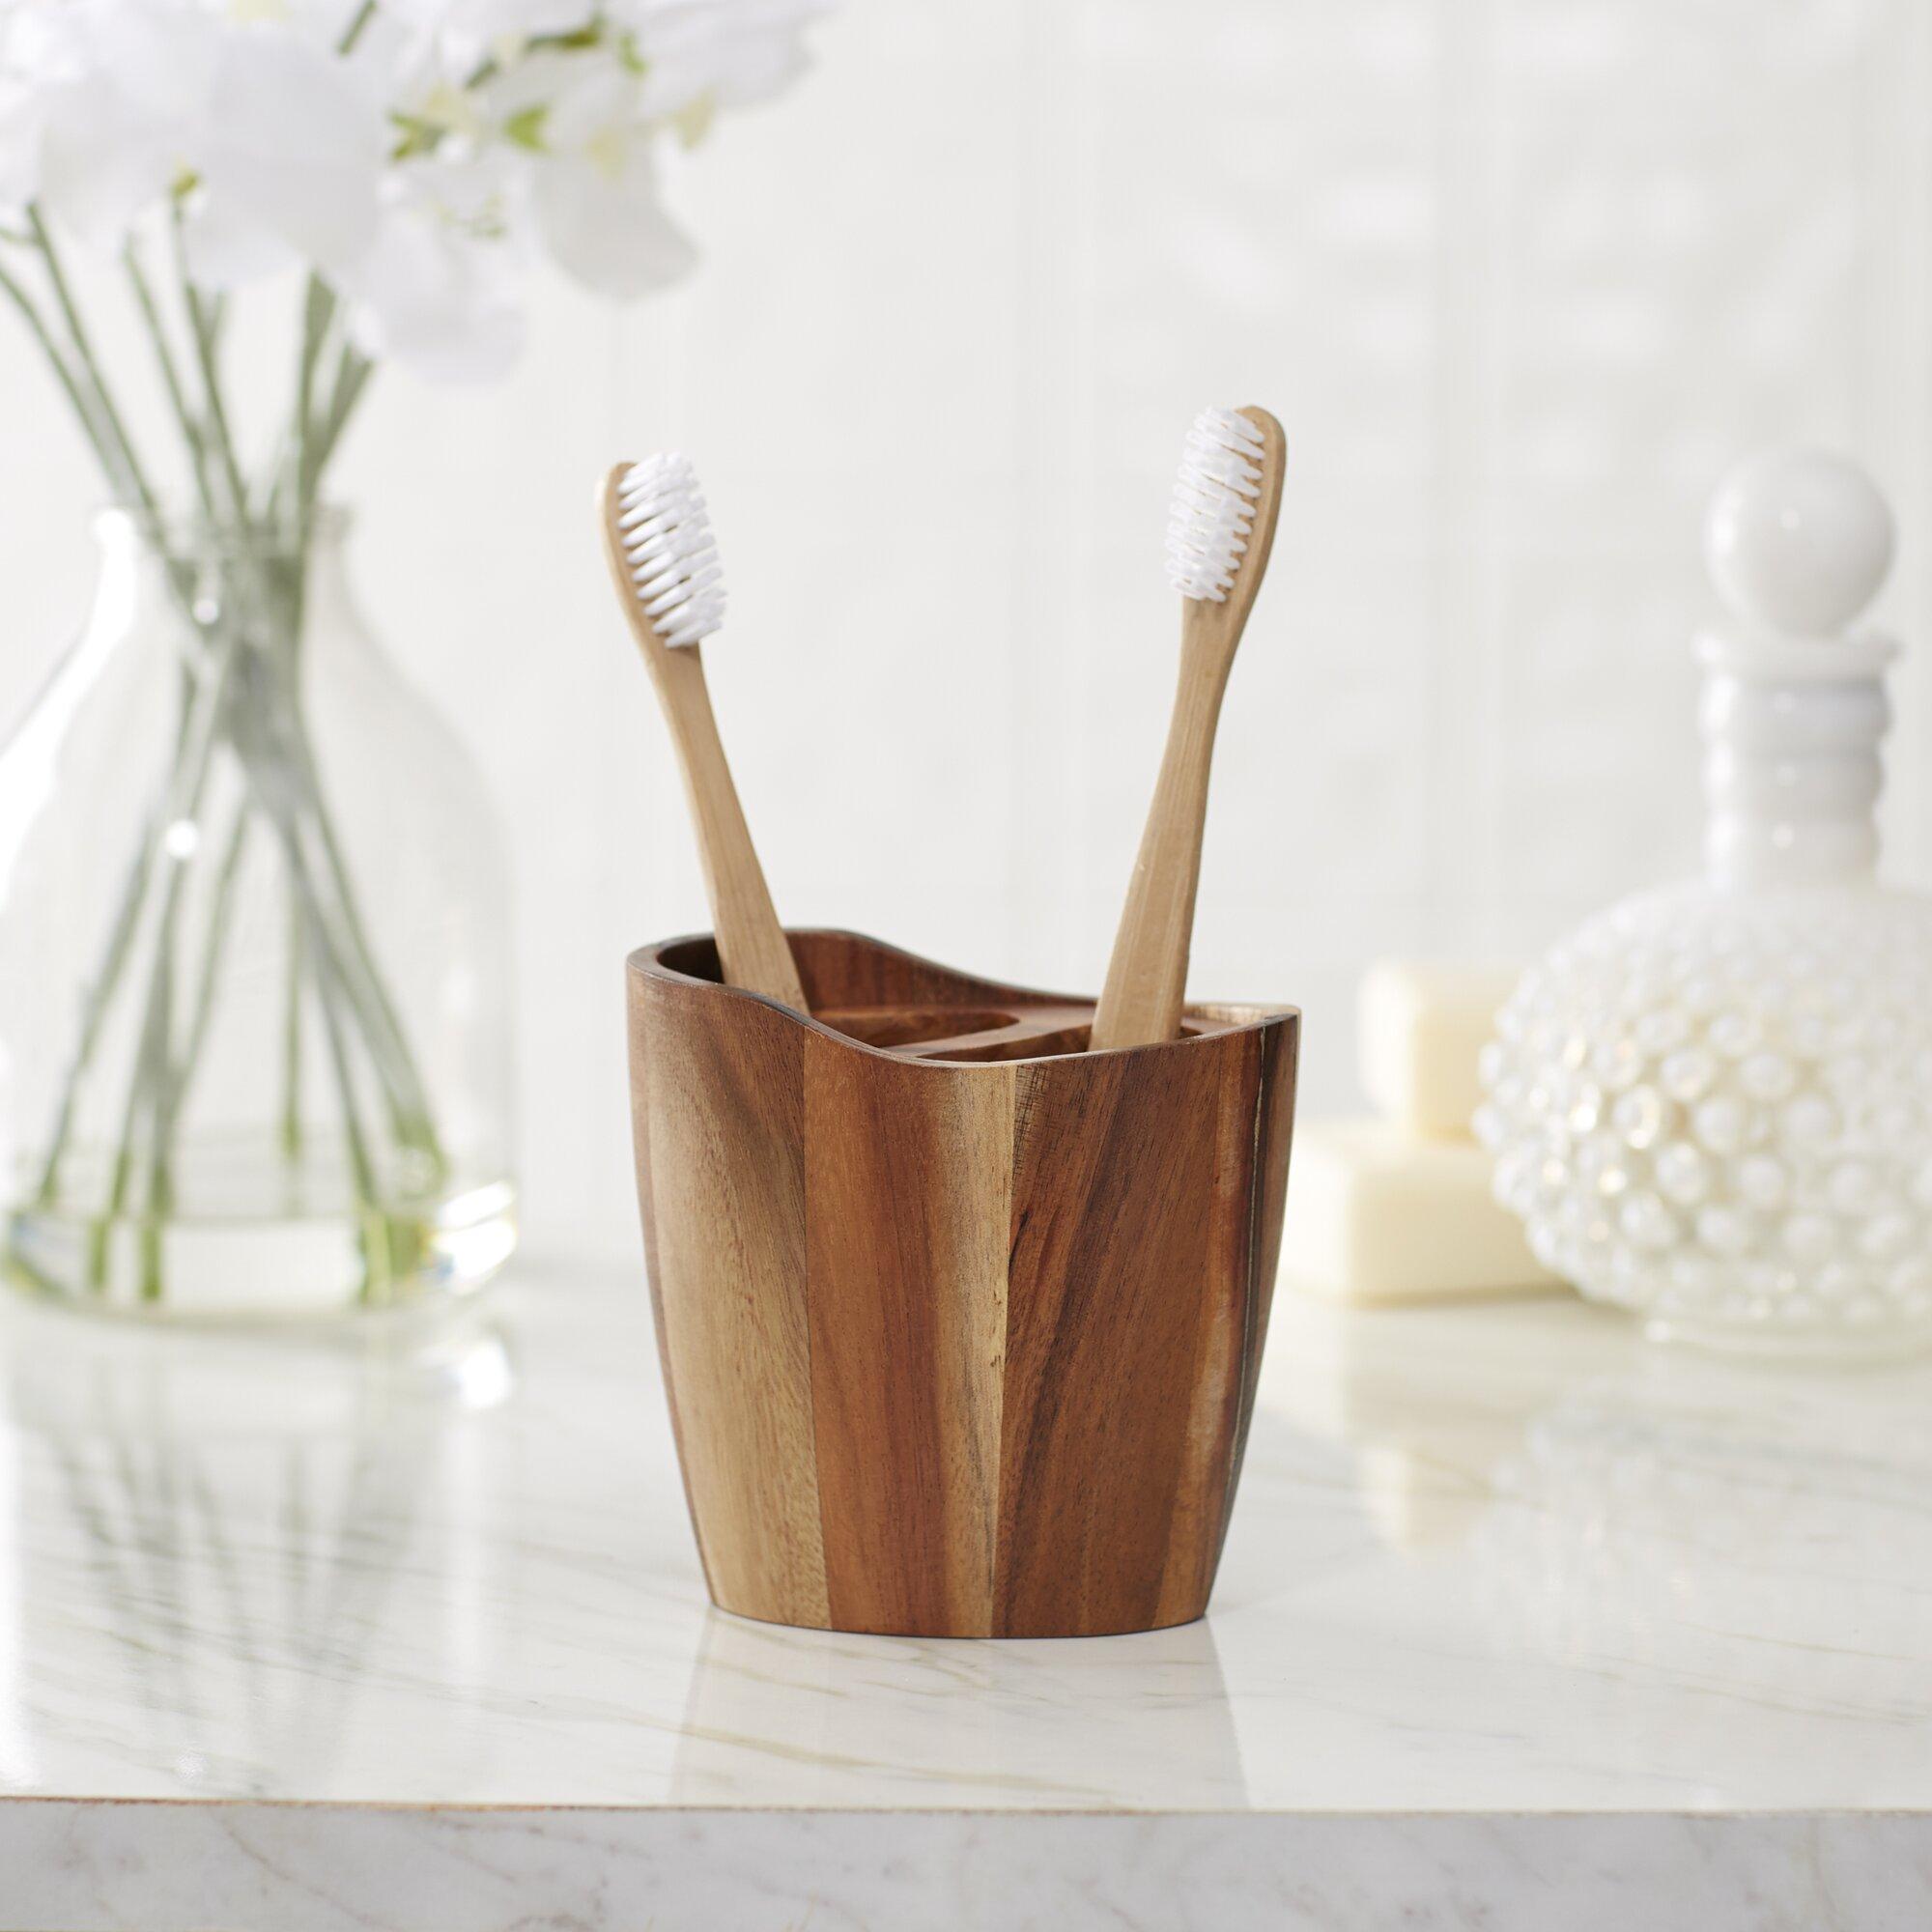 Driftwood Bathroom Accessories Wood Bathroom Accessories Youll Love Wayfair